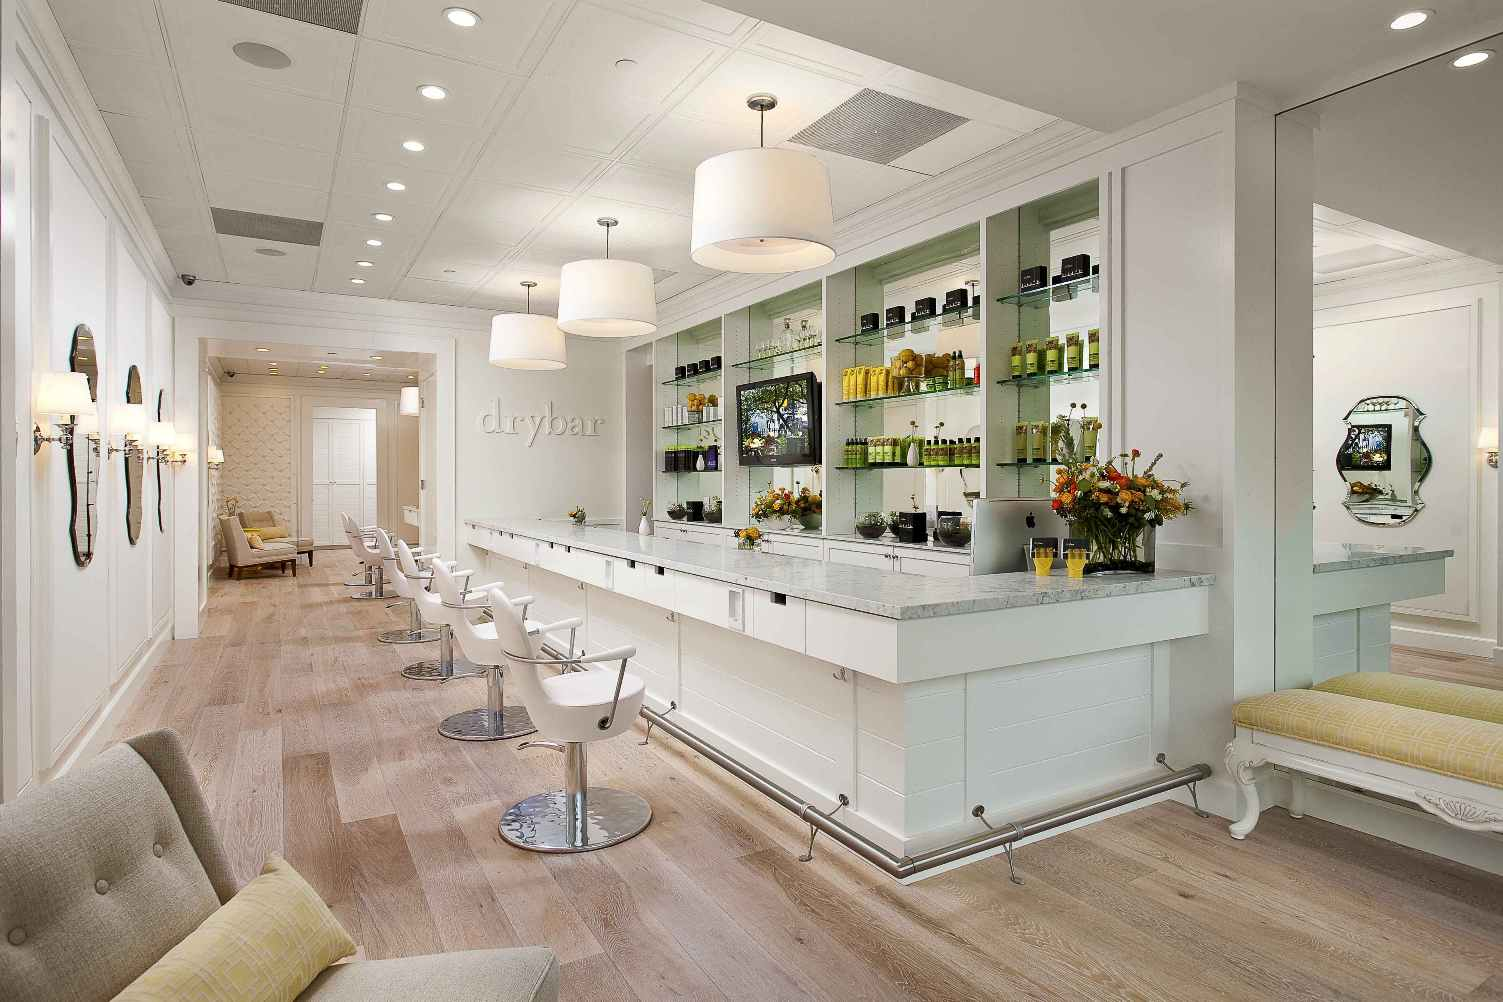 drybar interior design idea